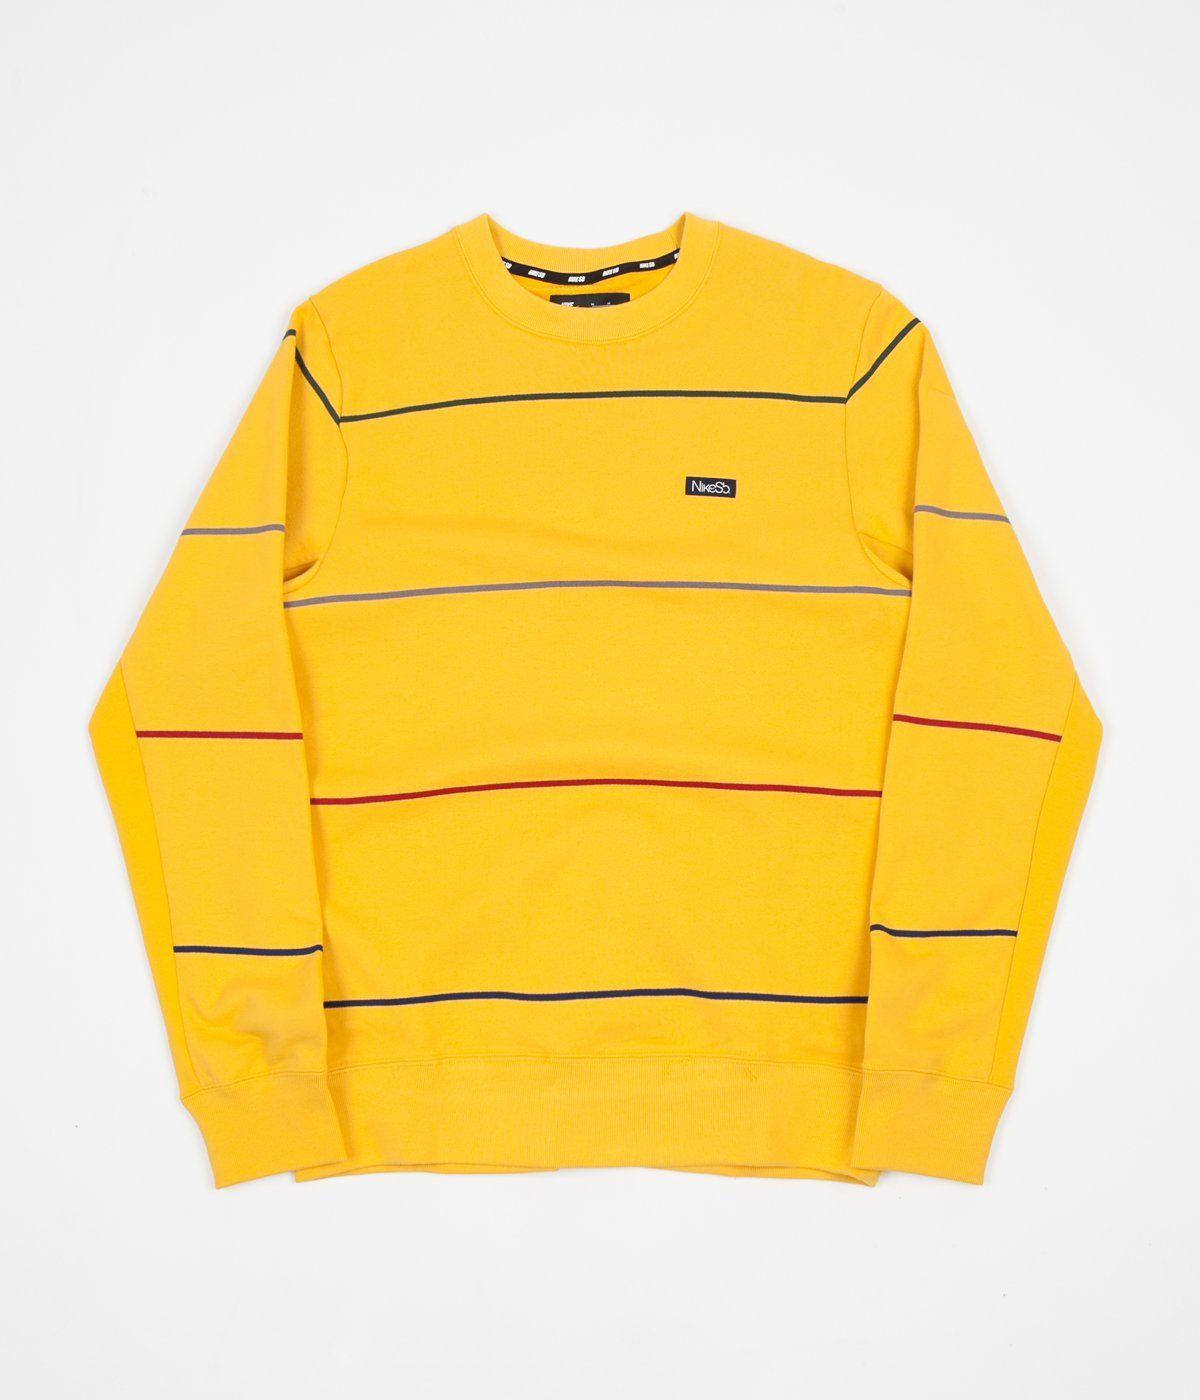 Nike Sb Everett Stripe Crewneck Sweatshirt Yellow Ochre Obsidian Yellow Sweatshirt Crew Neck Sweatshirt Sweatshirts [ 1400 x 1200 Pixel ]